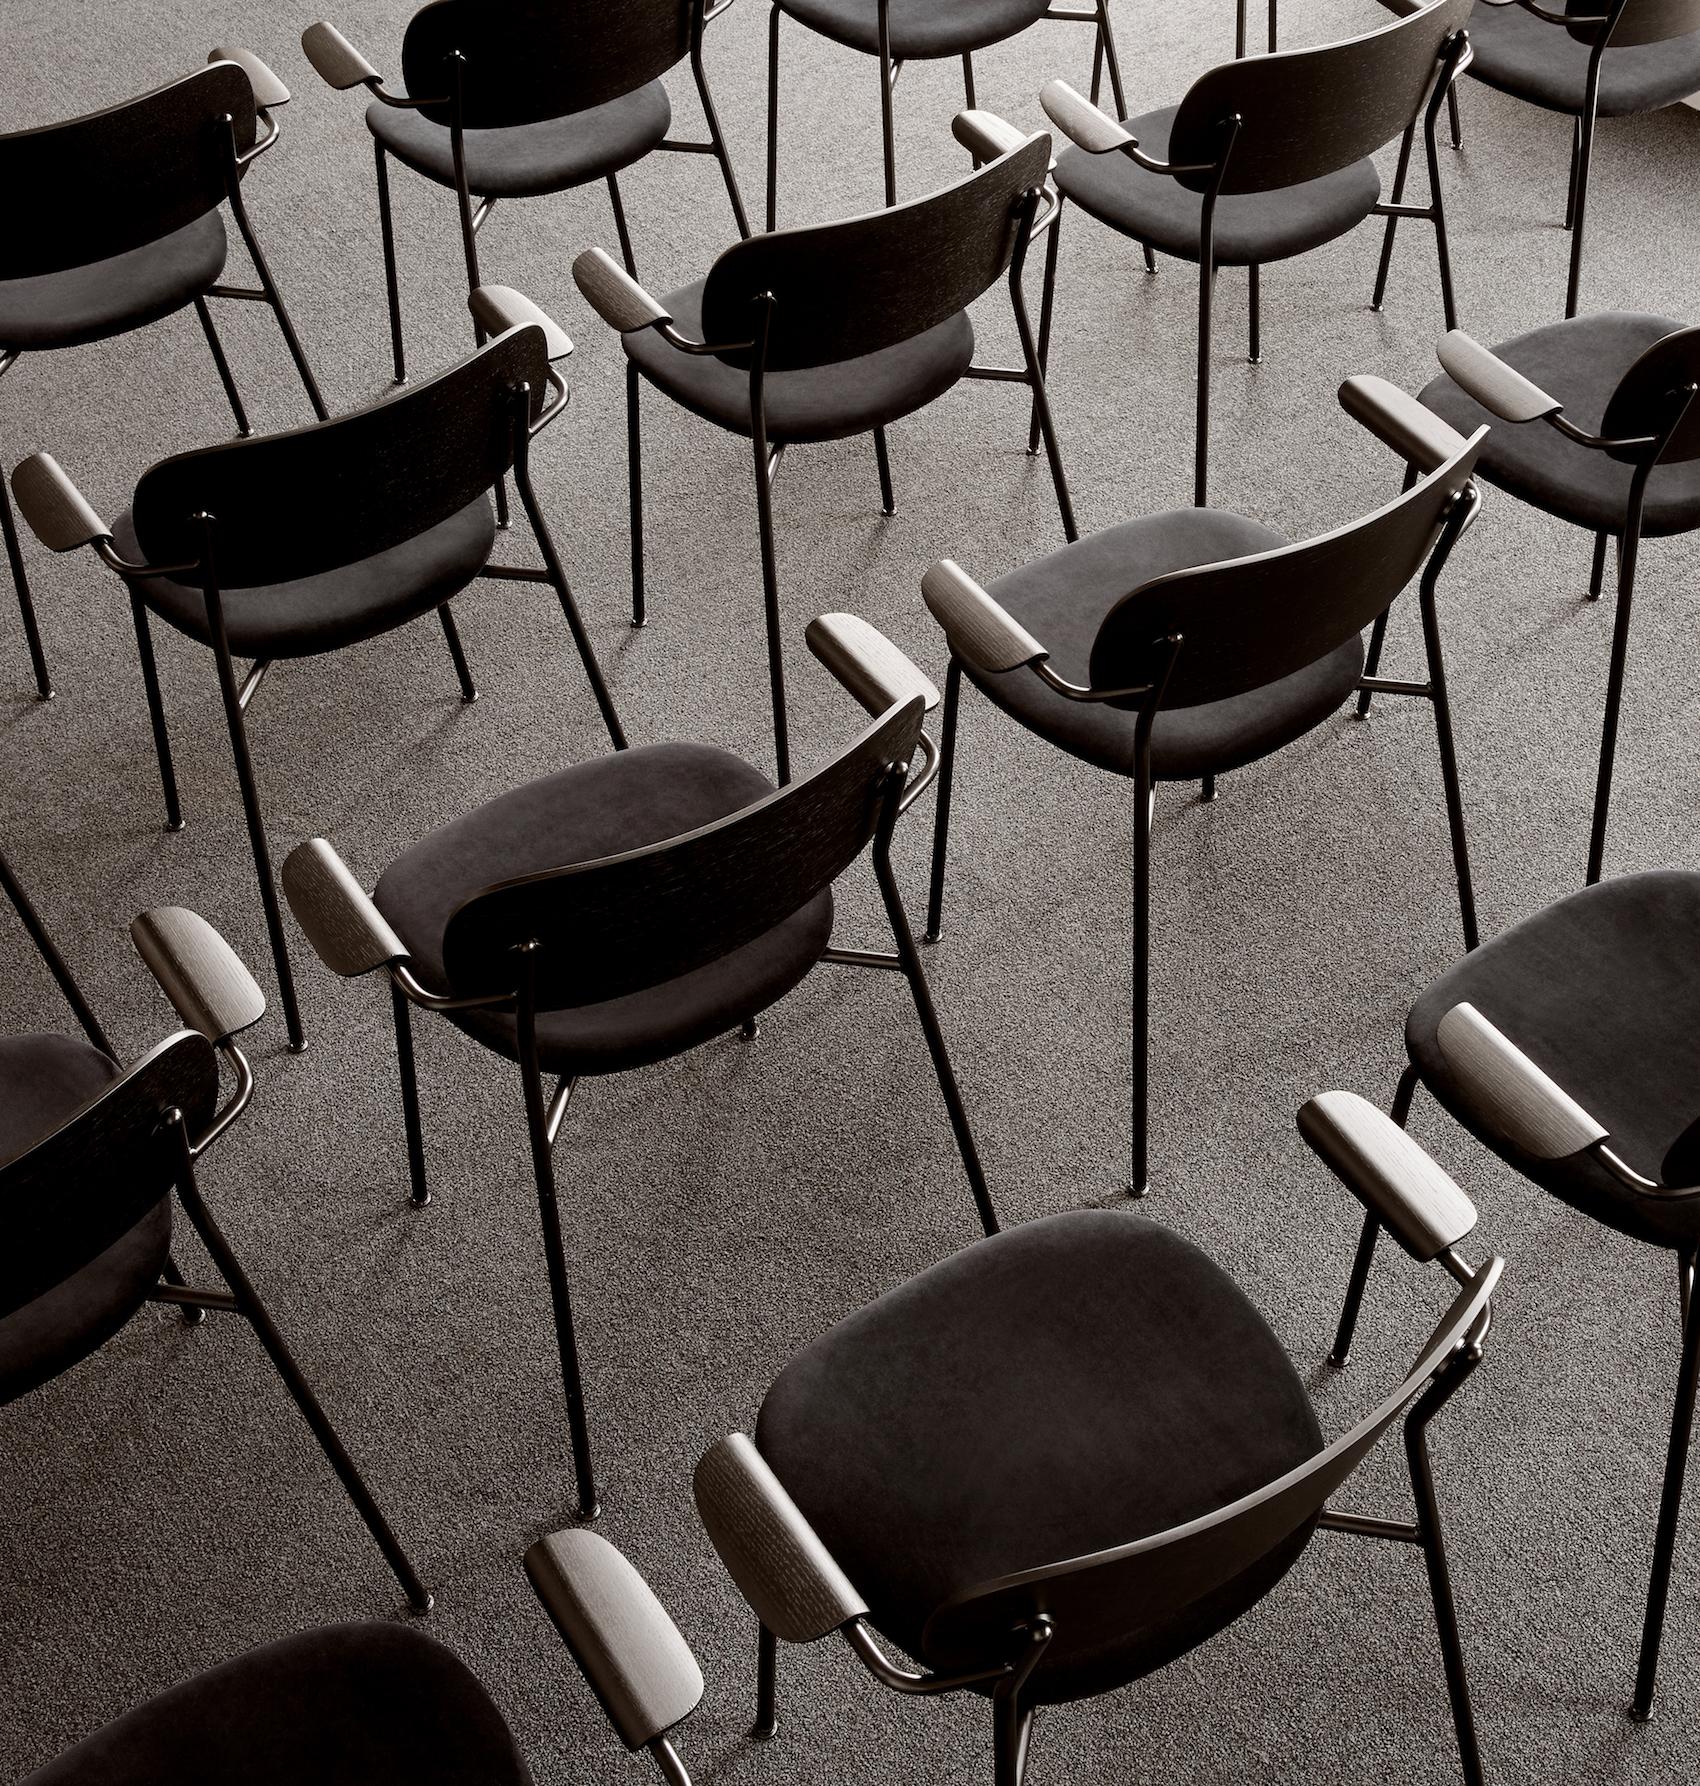 Co Chair The Lab Menu, modern furniture, chair, scandinavian design, scandinavian home Gridiron project London 2.jpg